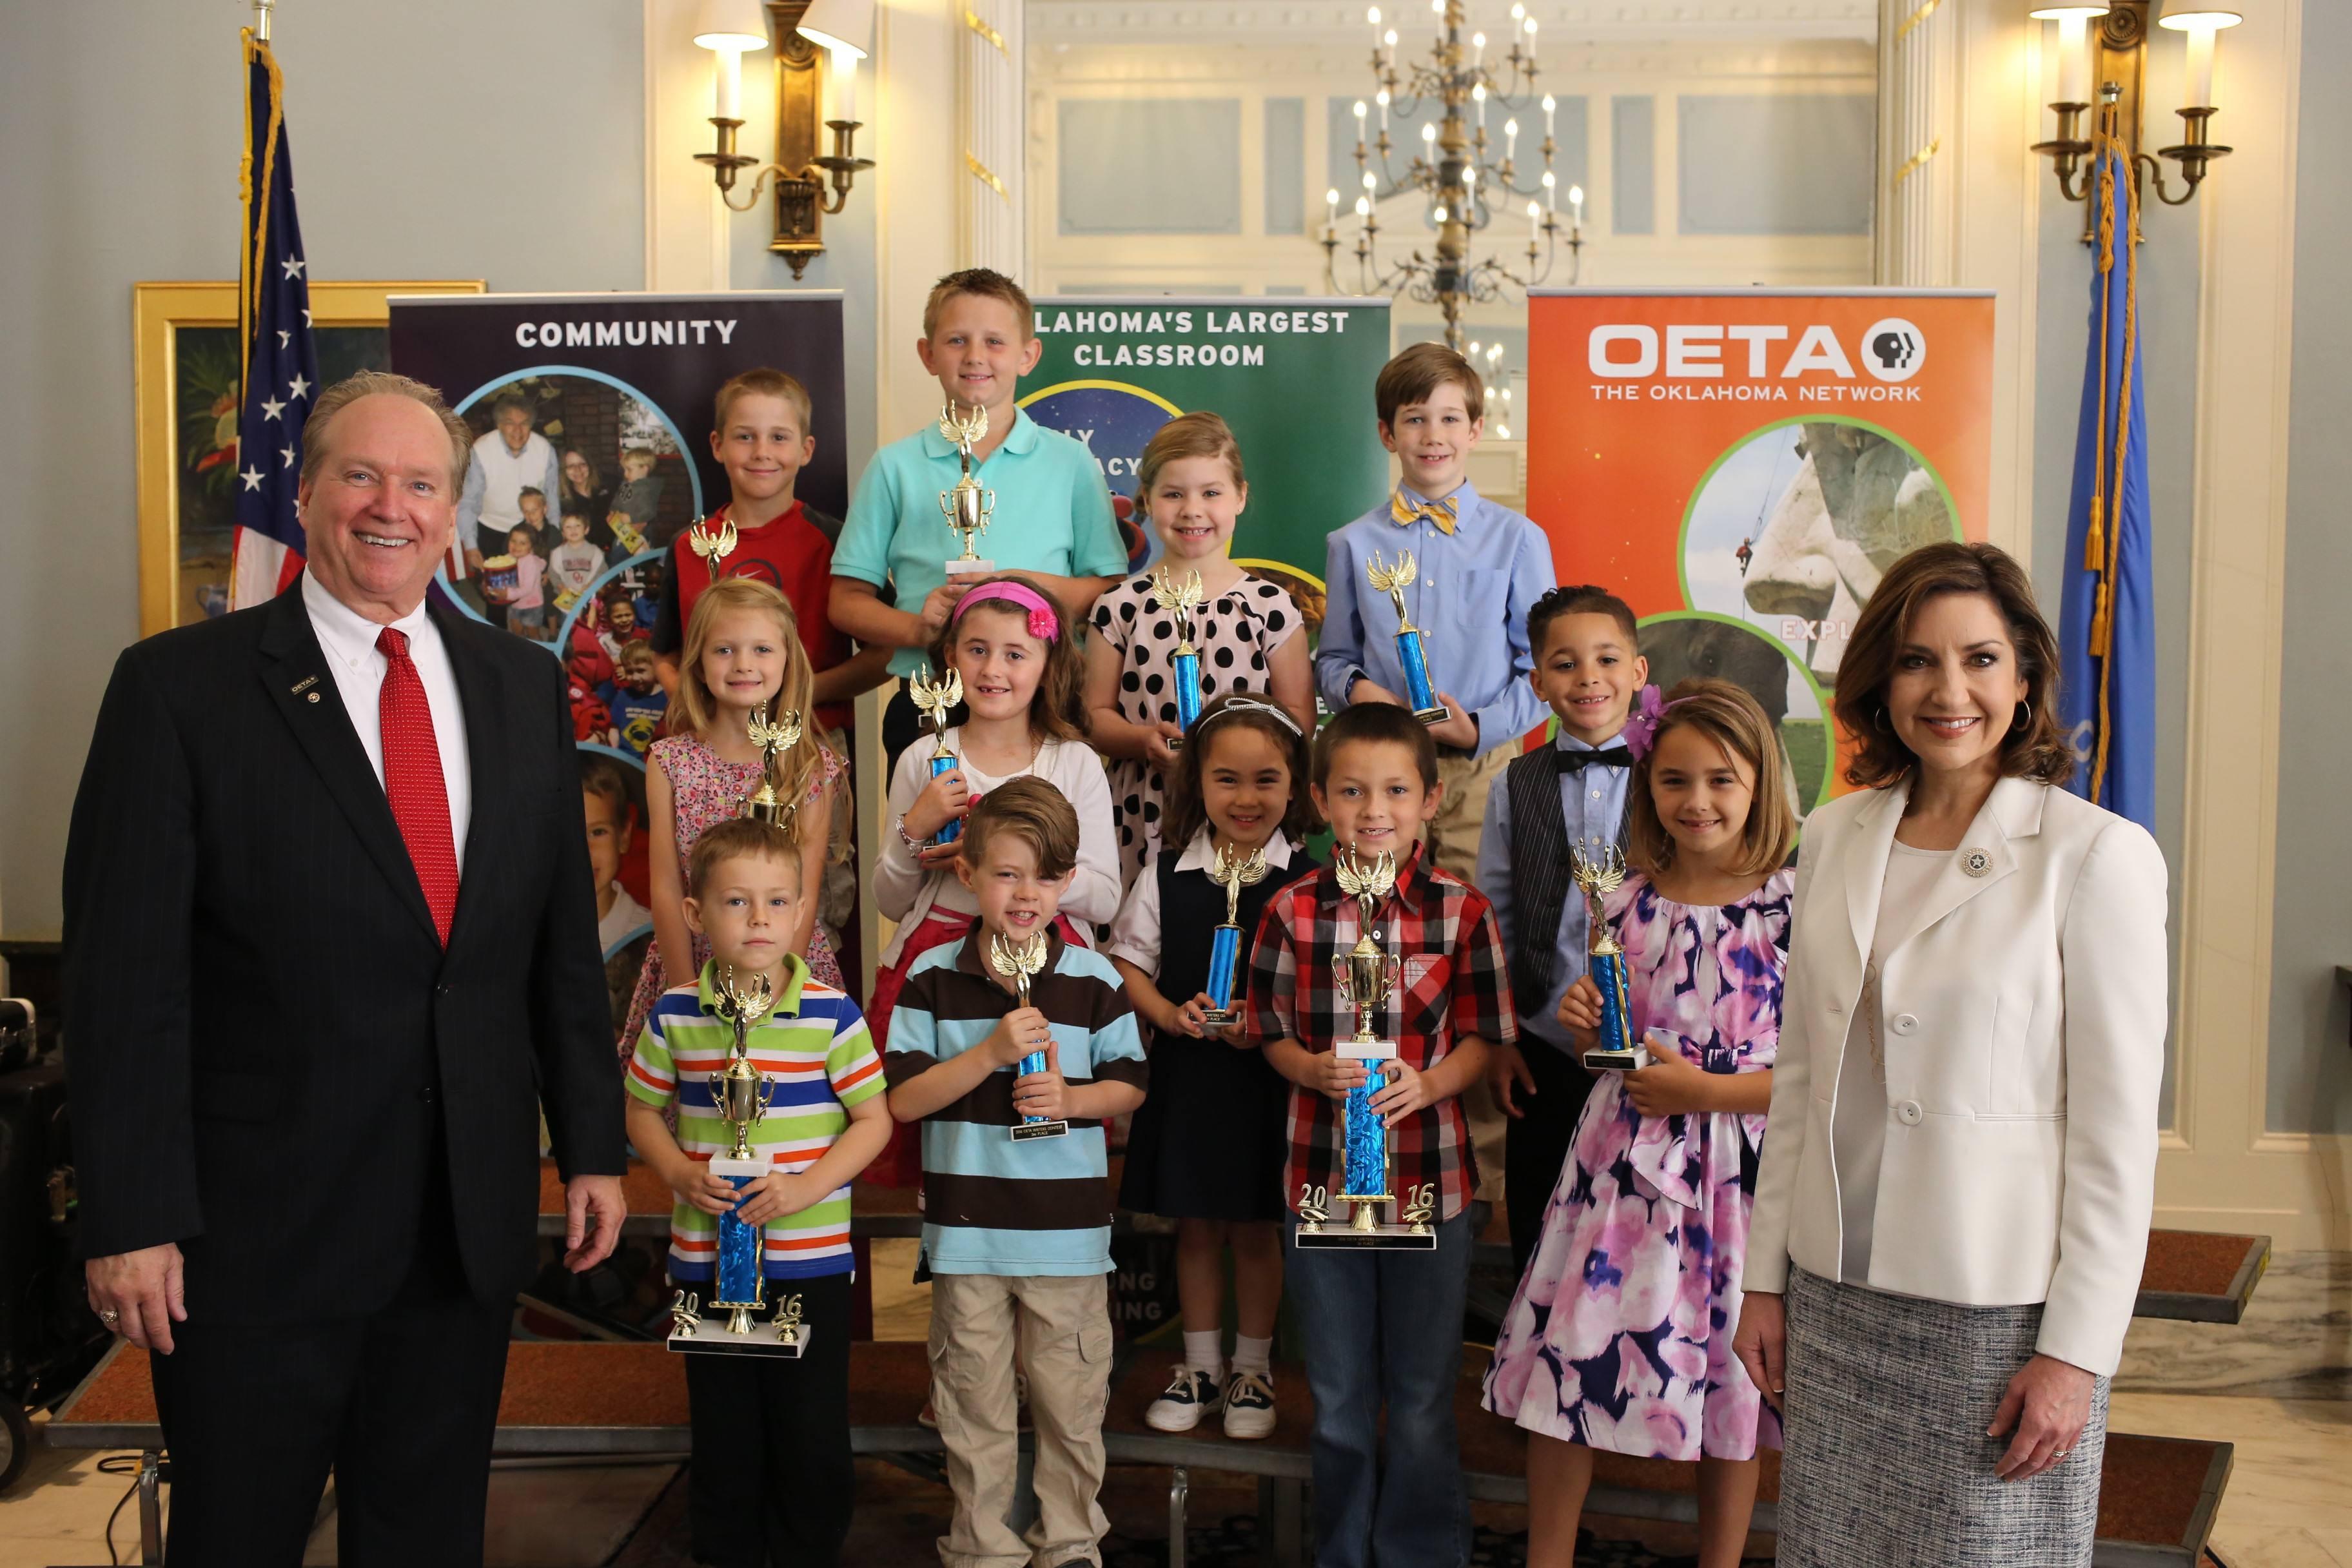 Oeta Announces Writers Contest Winners